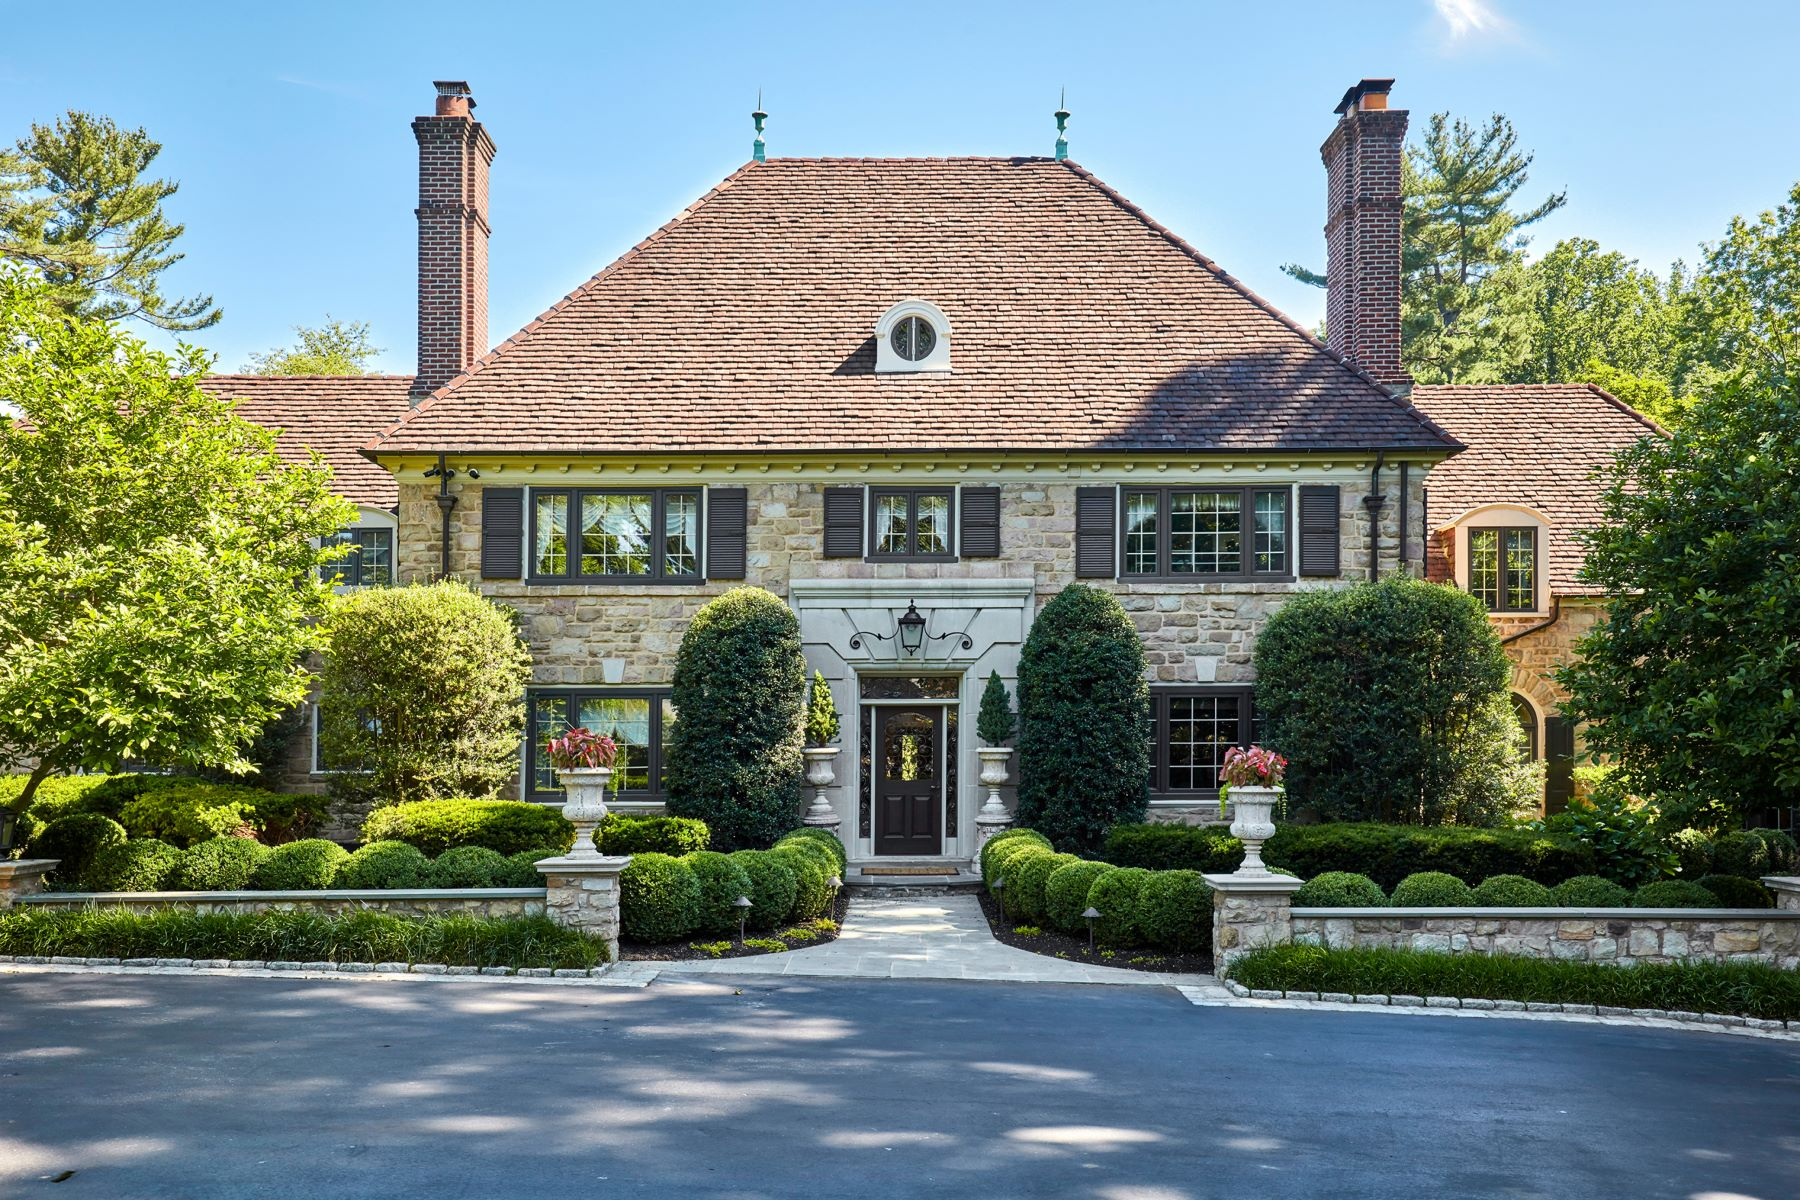 Single Family Home for Sale at 1241 Ridgewood Rd 1241 RIDGEWOOD RD Bryn Mawr, Pennsylvania 19010 United States